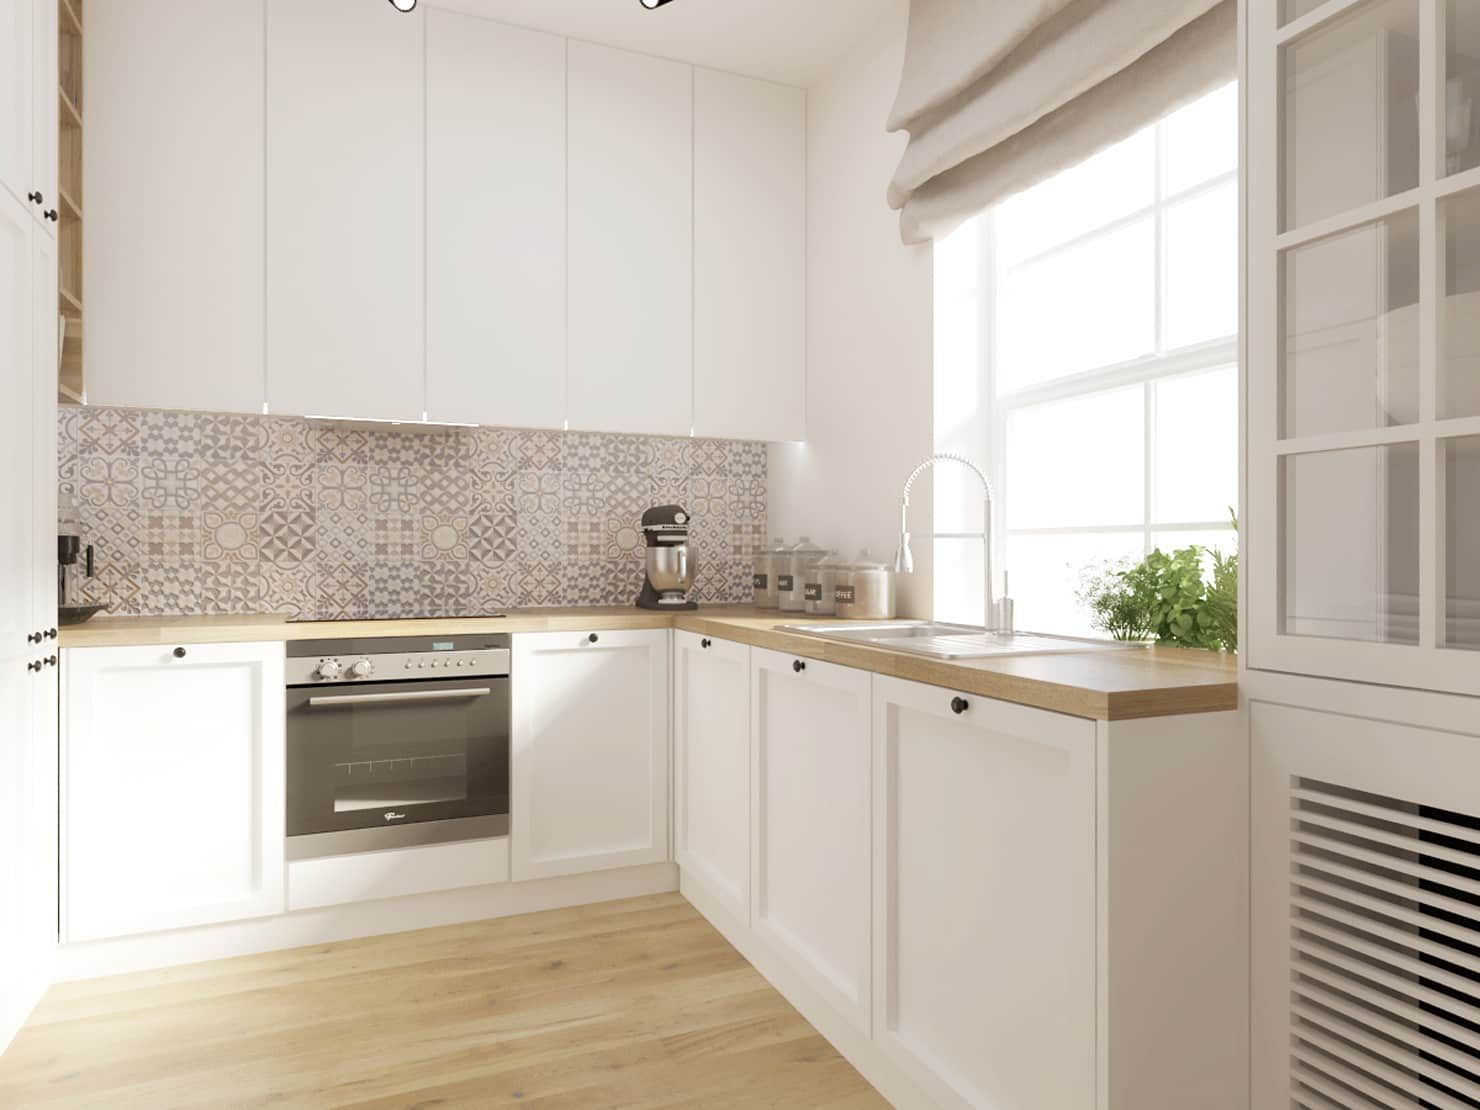 Biala Kuchnia Z Drewnianym Blatem So Interiors Architektura Wnetrz Rustykalna Kuchnia Drewno Bialy Homify Kitchen Design Small Kitchen Design Kitchen